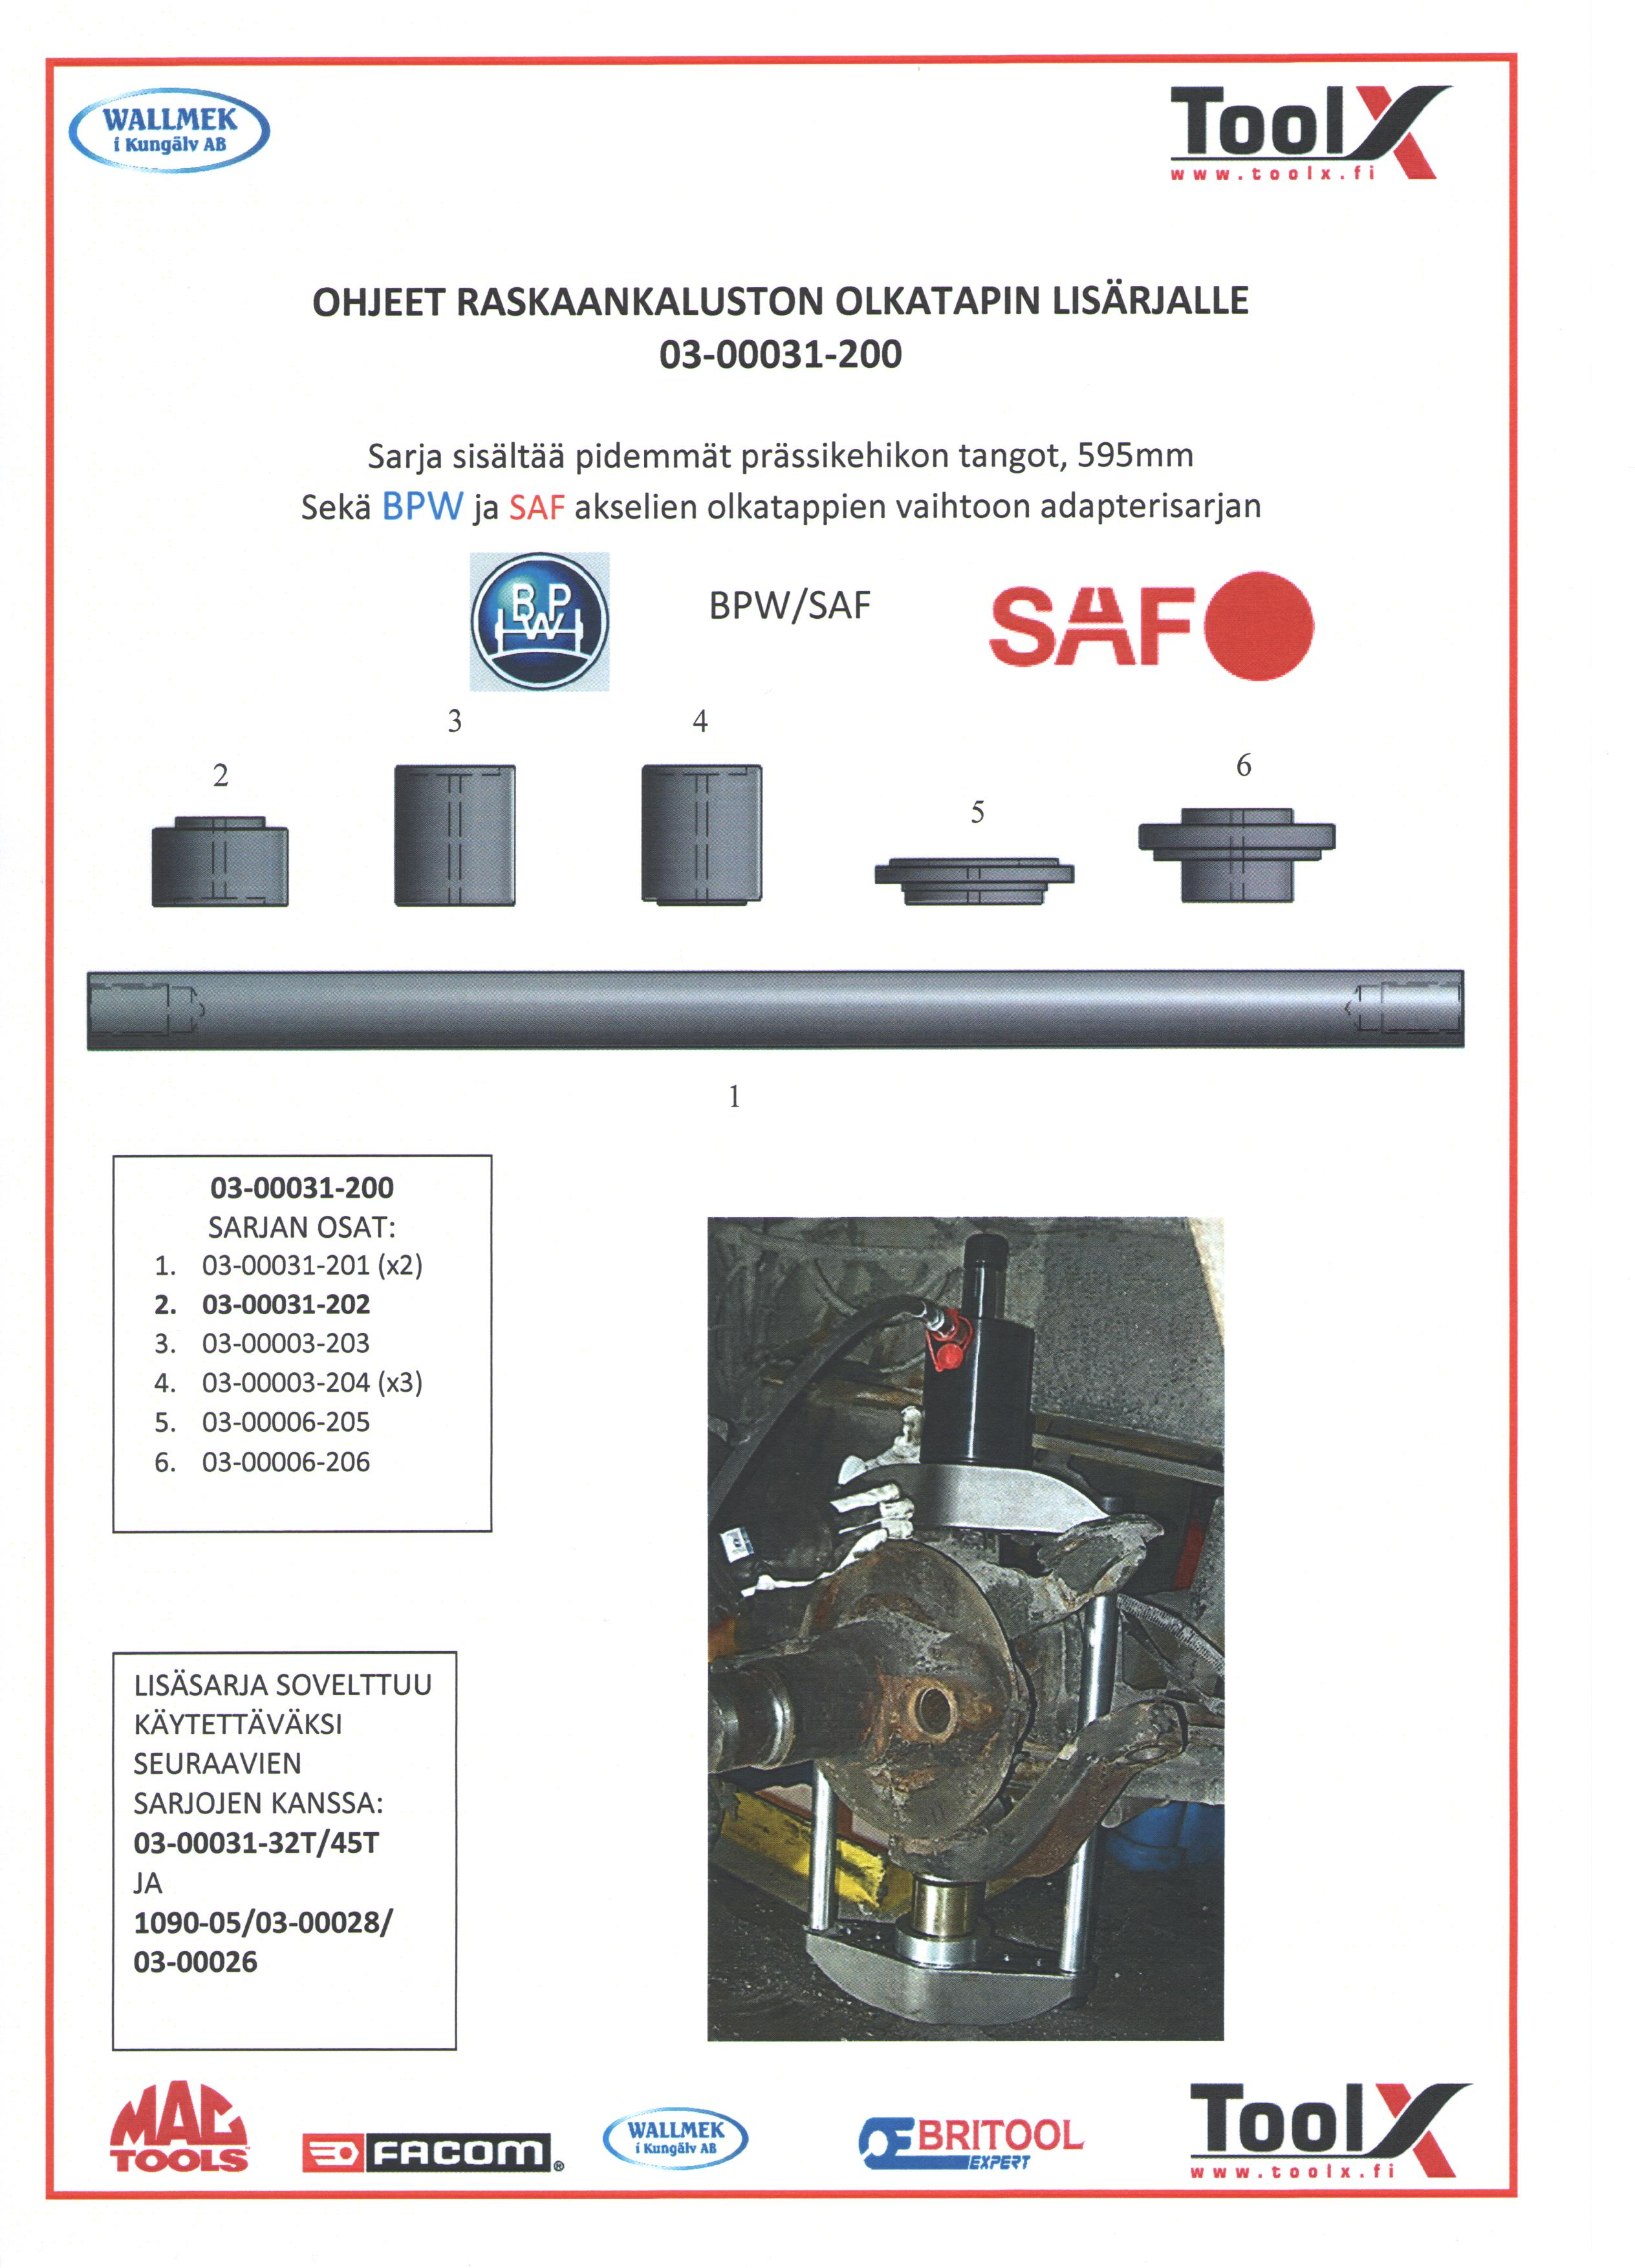 SAF & BPW adapterit - 1 001